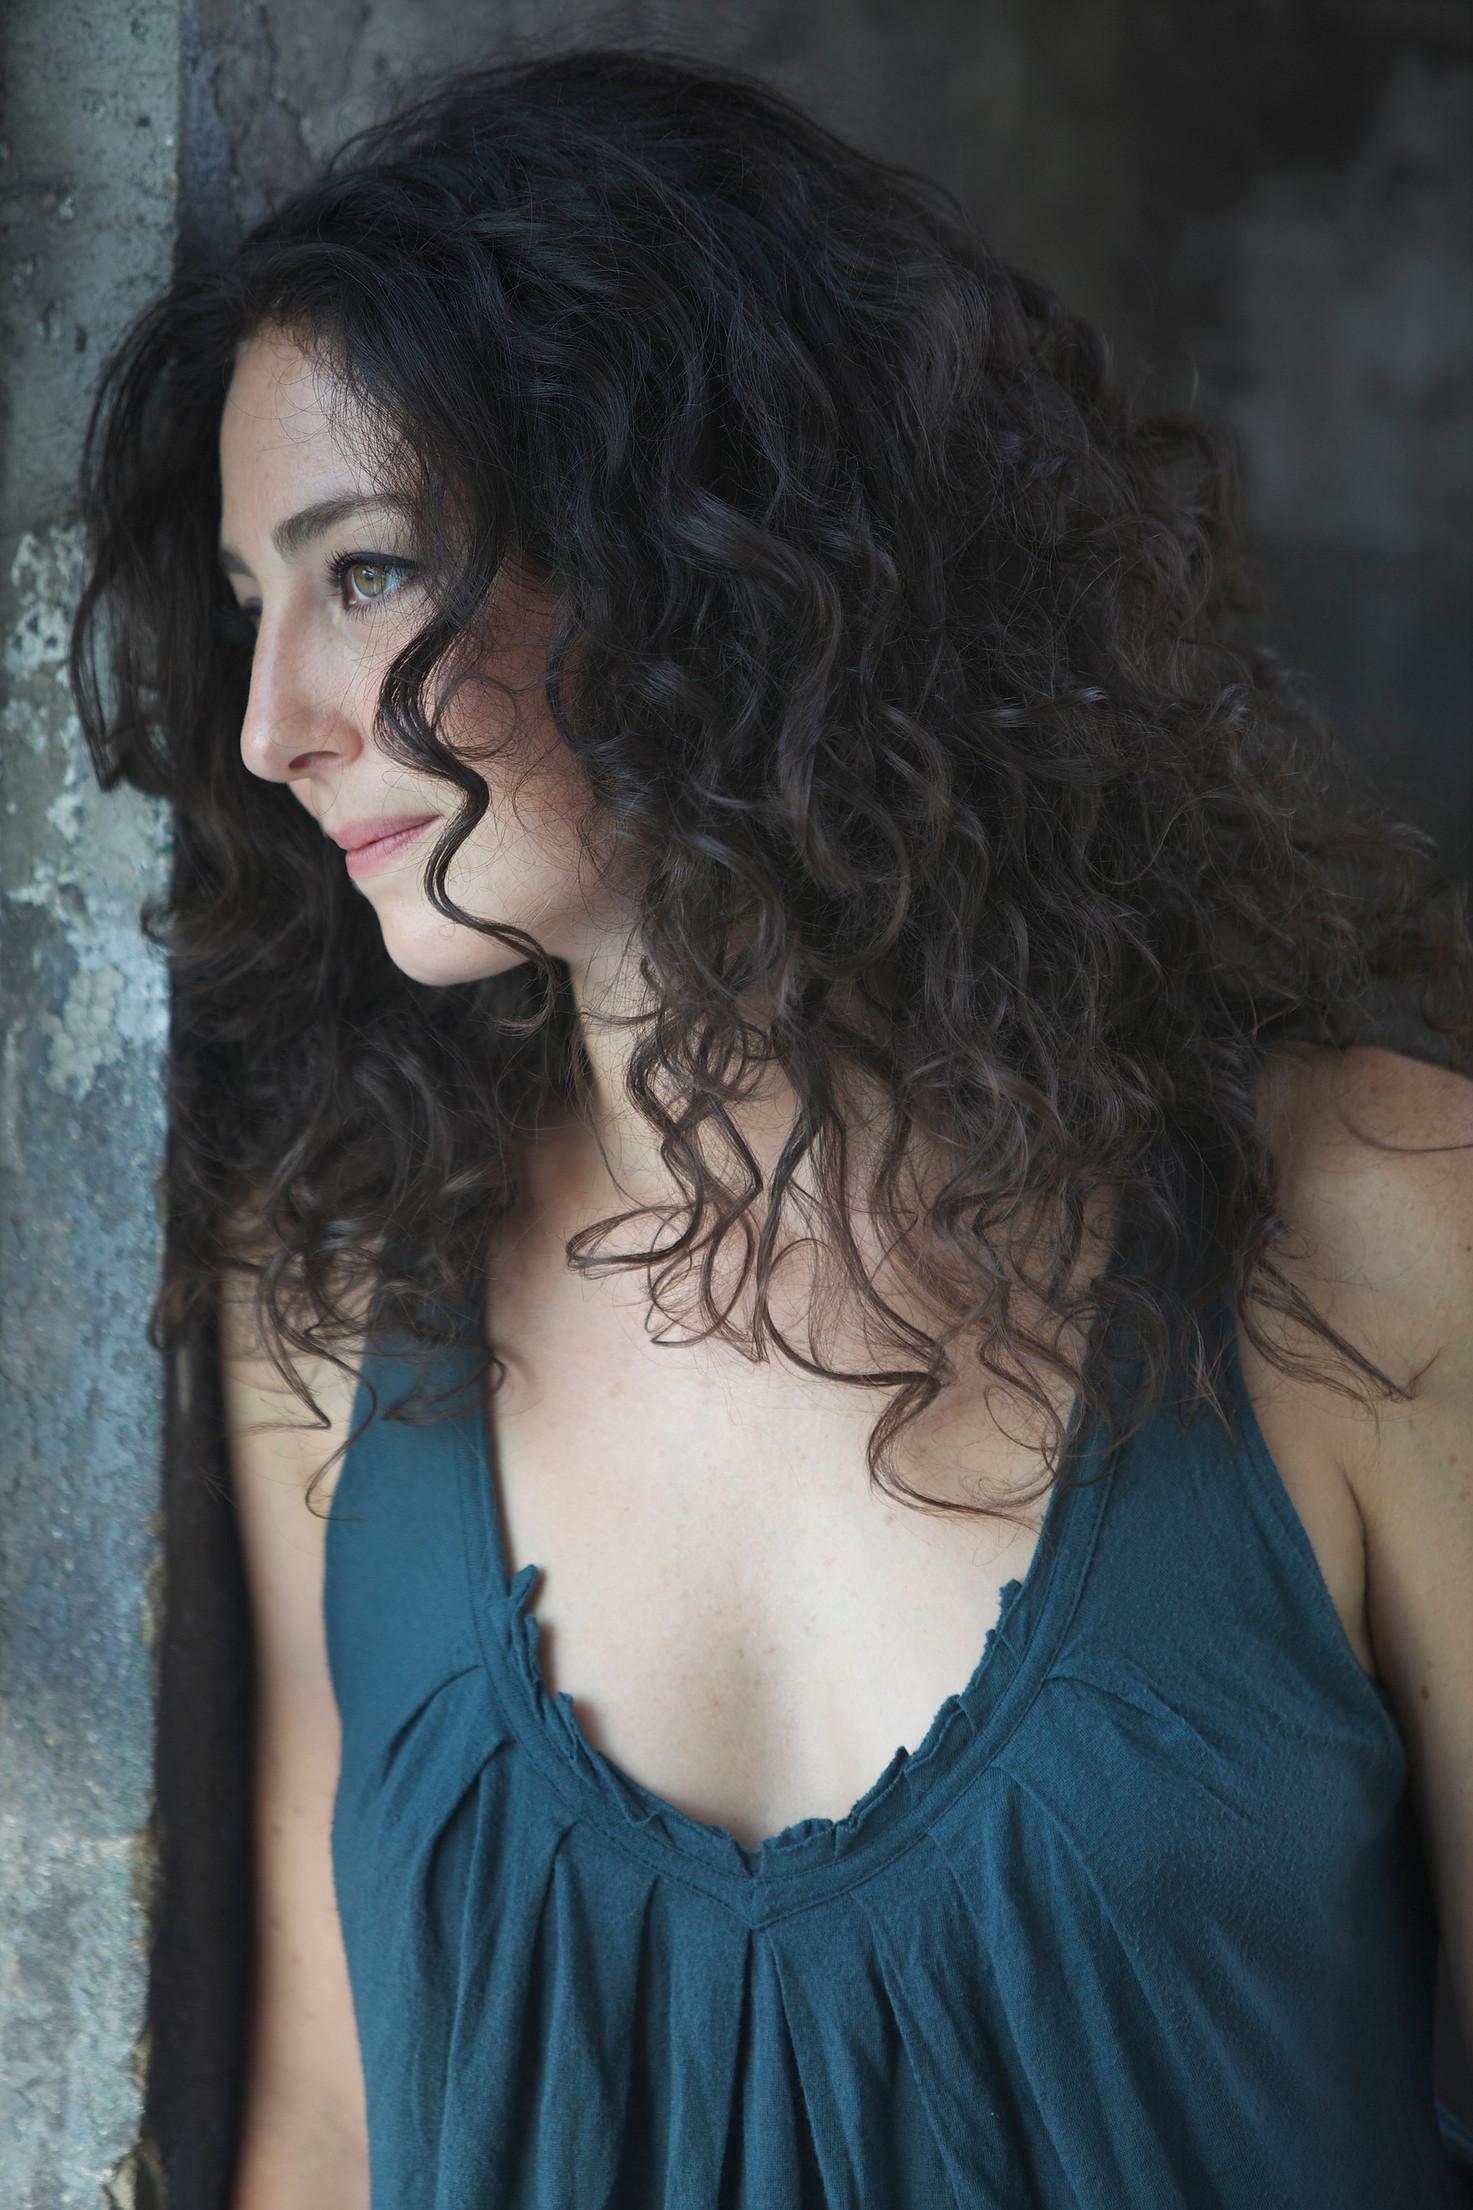 Olivia Foschi